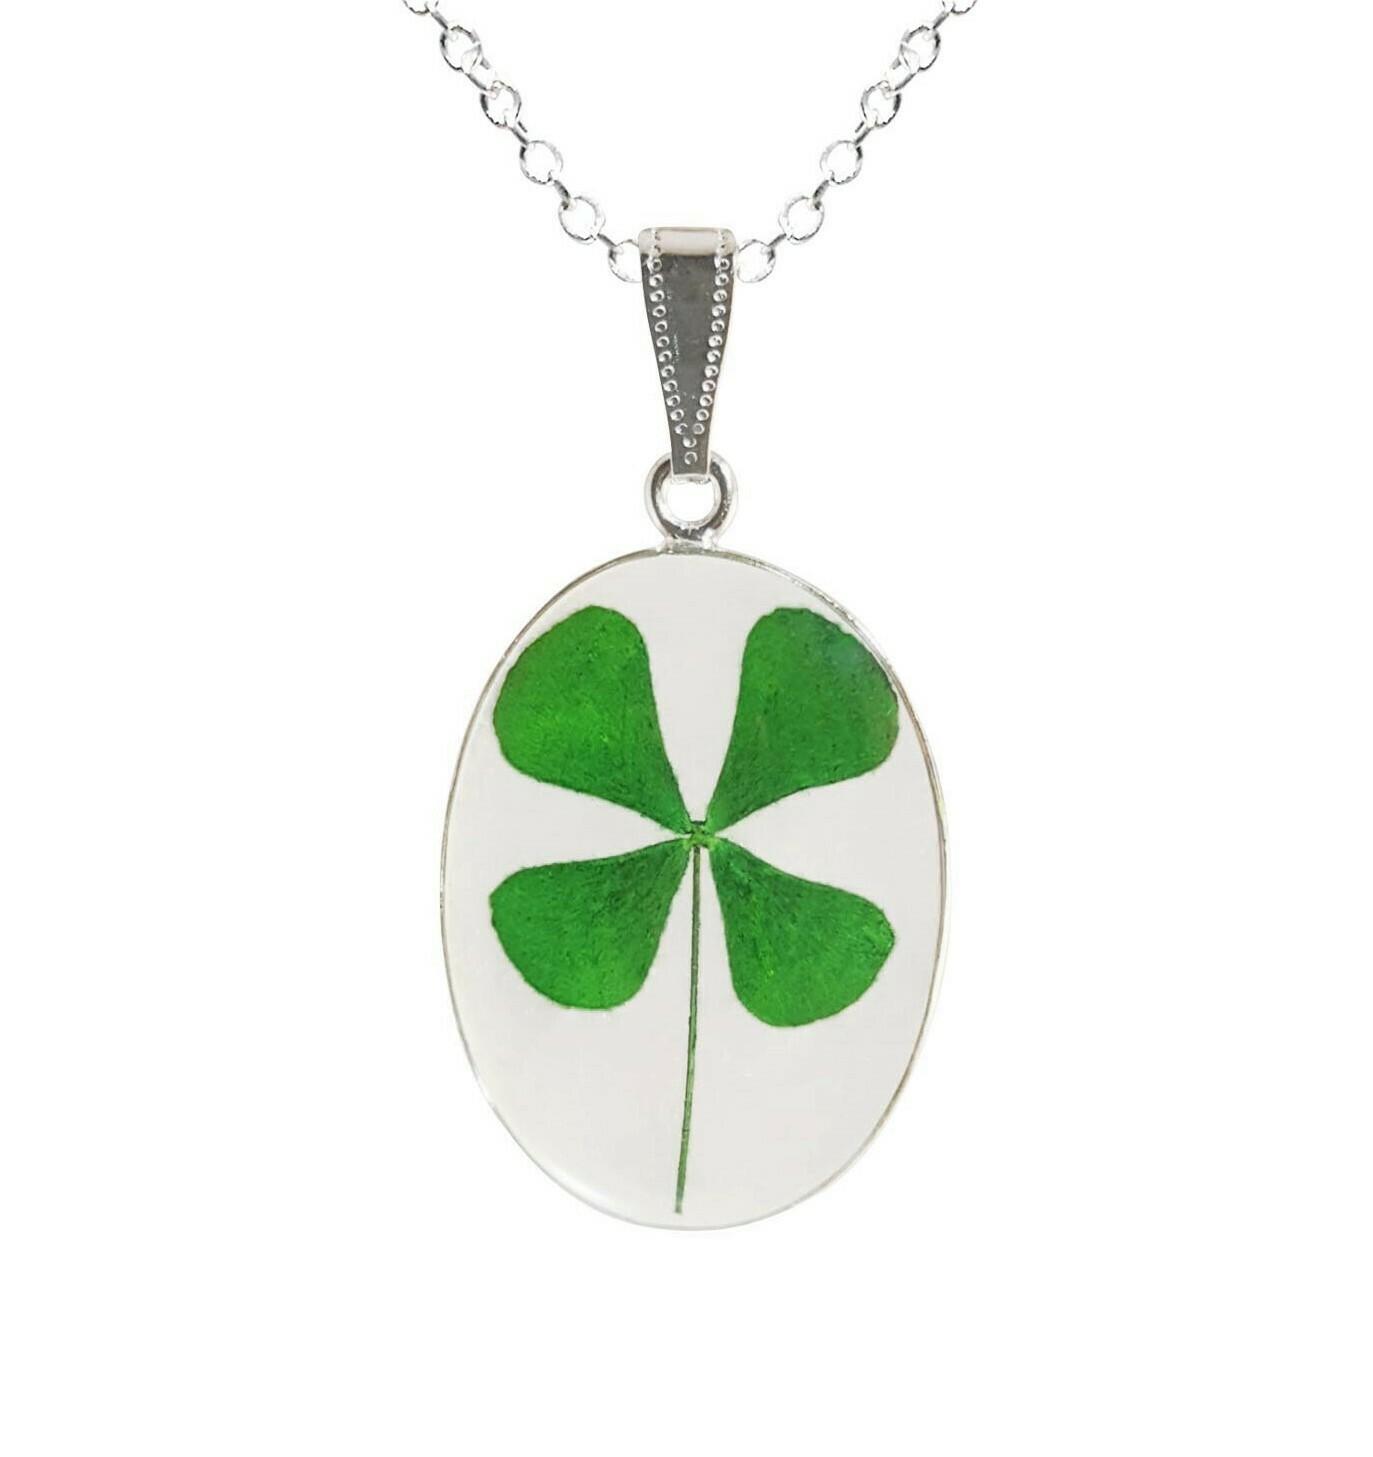 Clover Necklace, Large Oval, Transparent